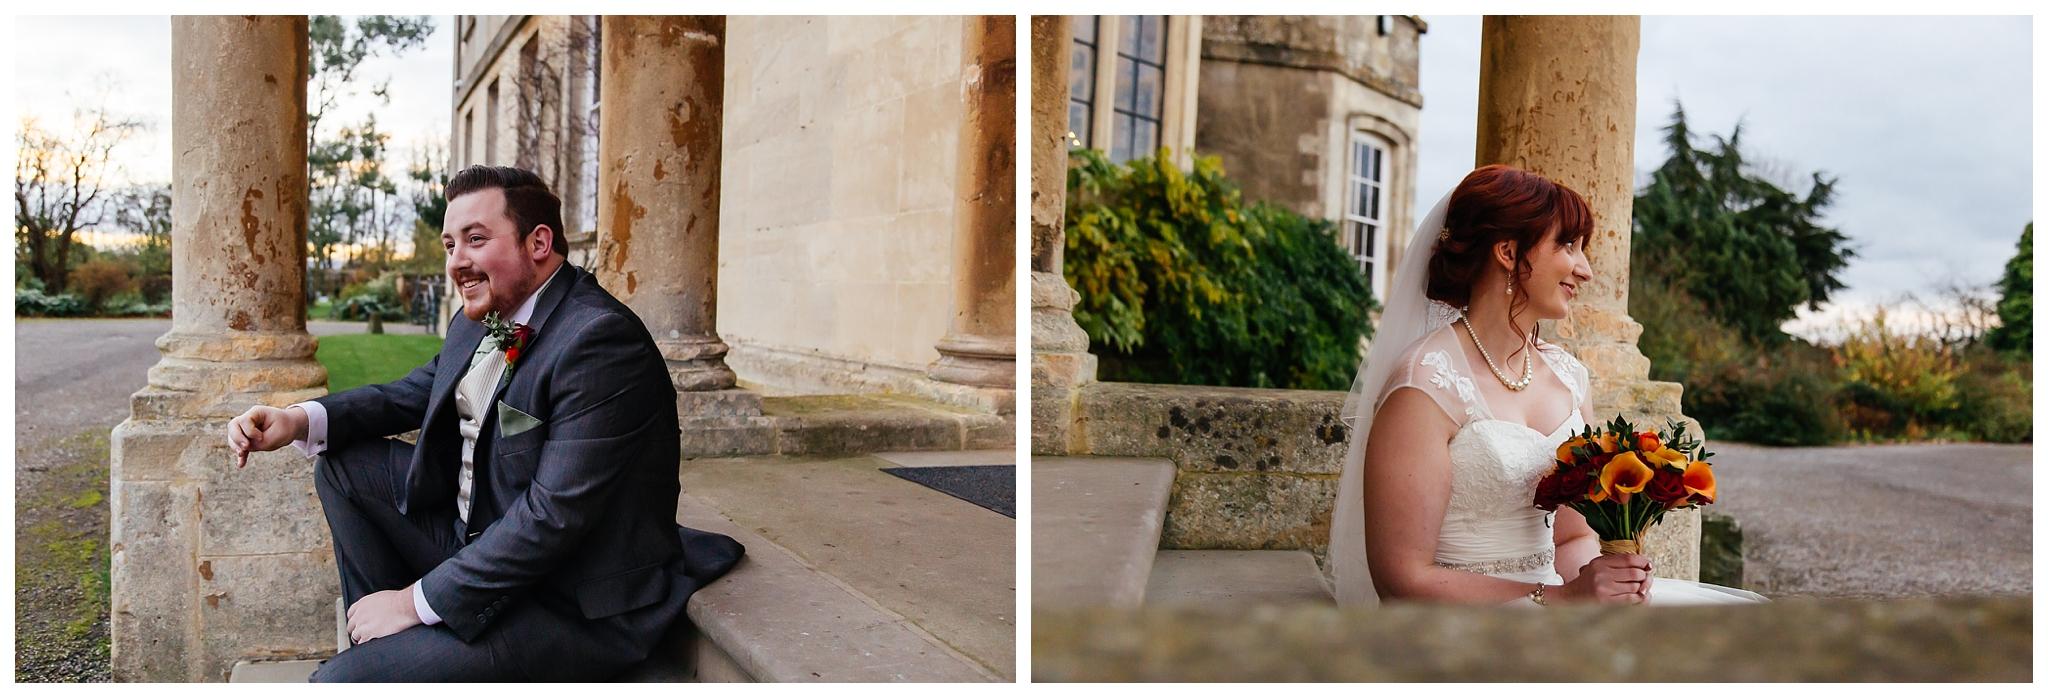 Emma&Paul-Elmore-Court-Winter-Wedding-Nikki-Cooper-Photography_0071.jpg